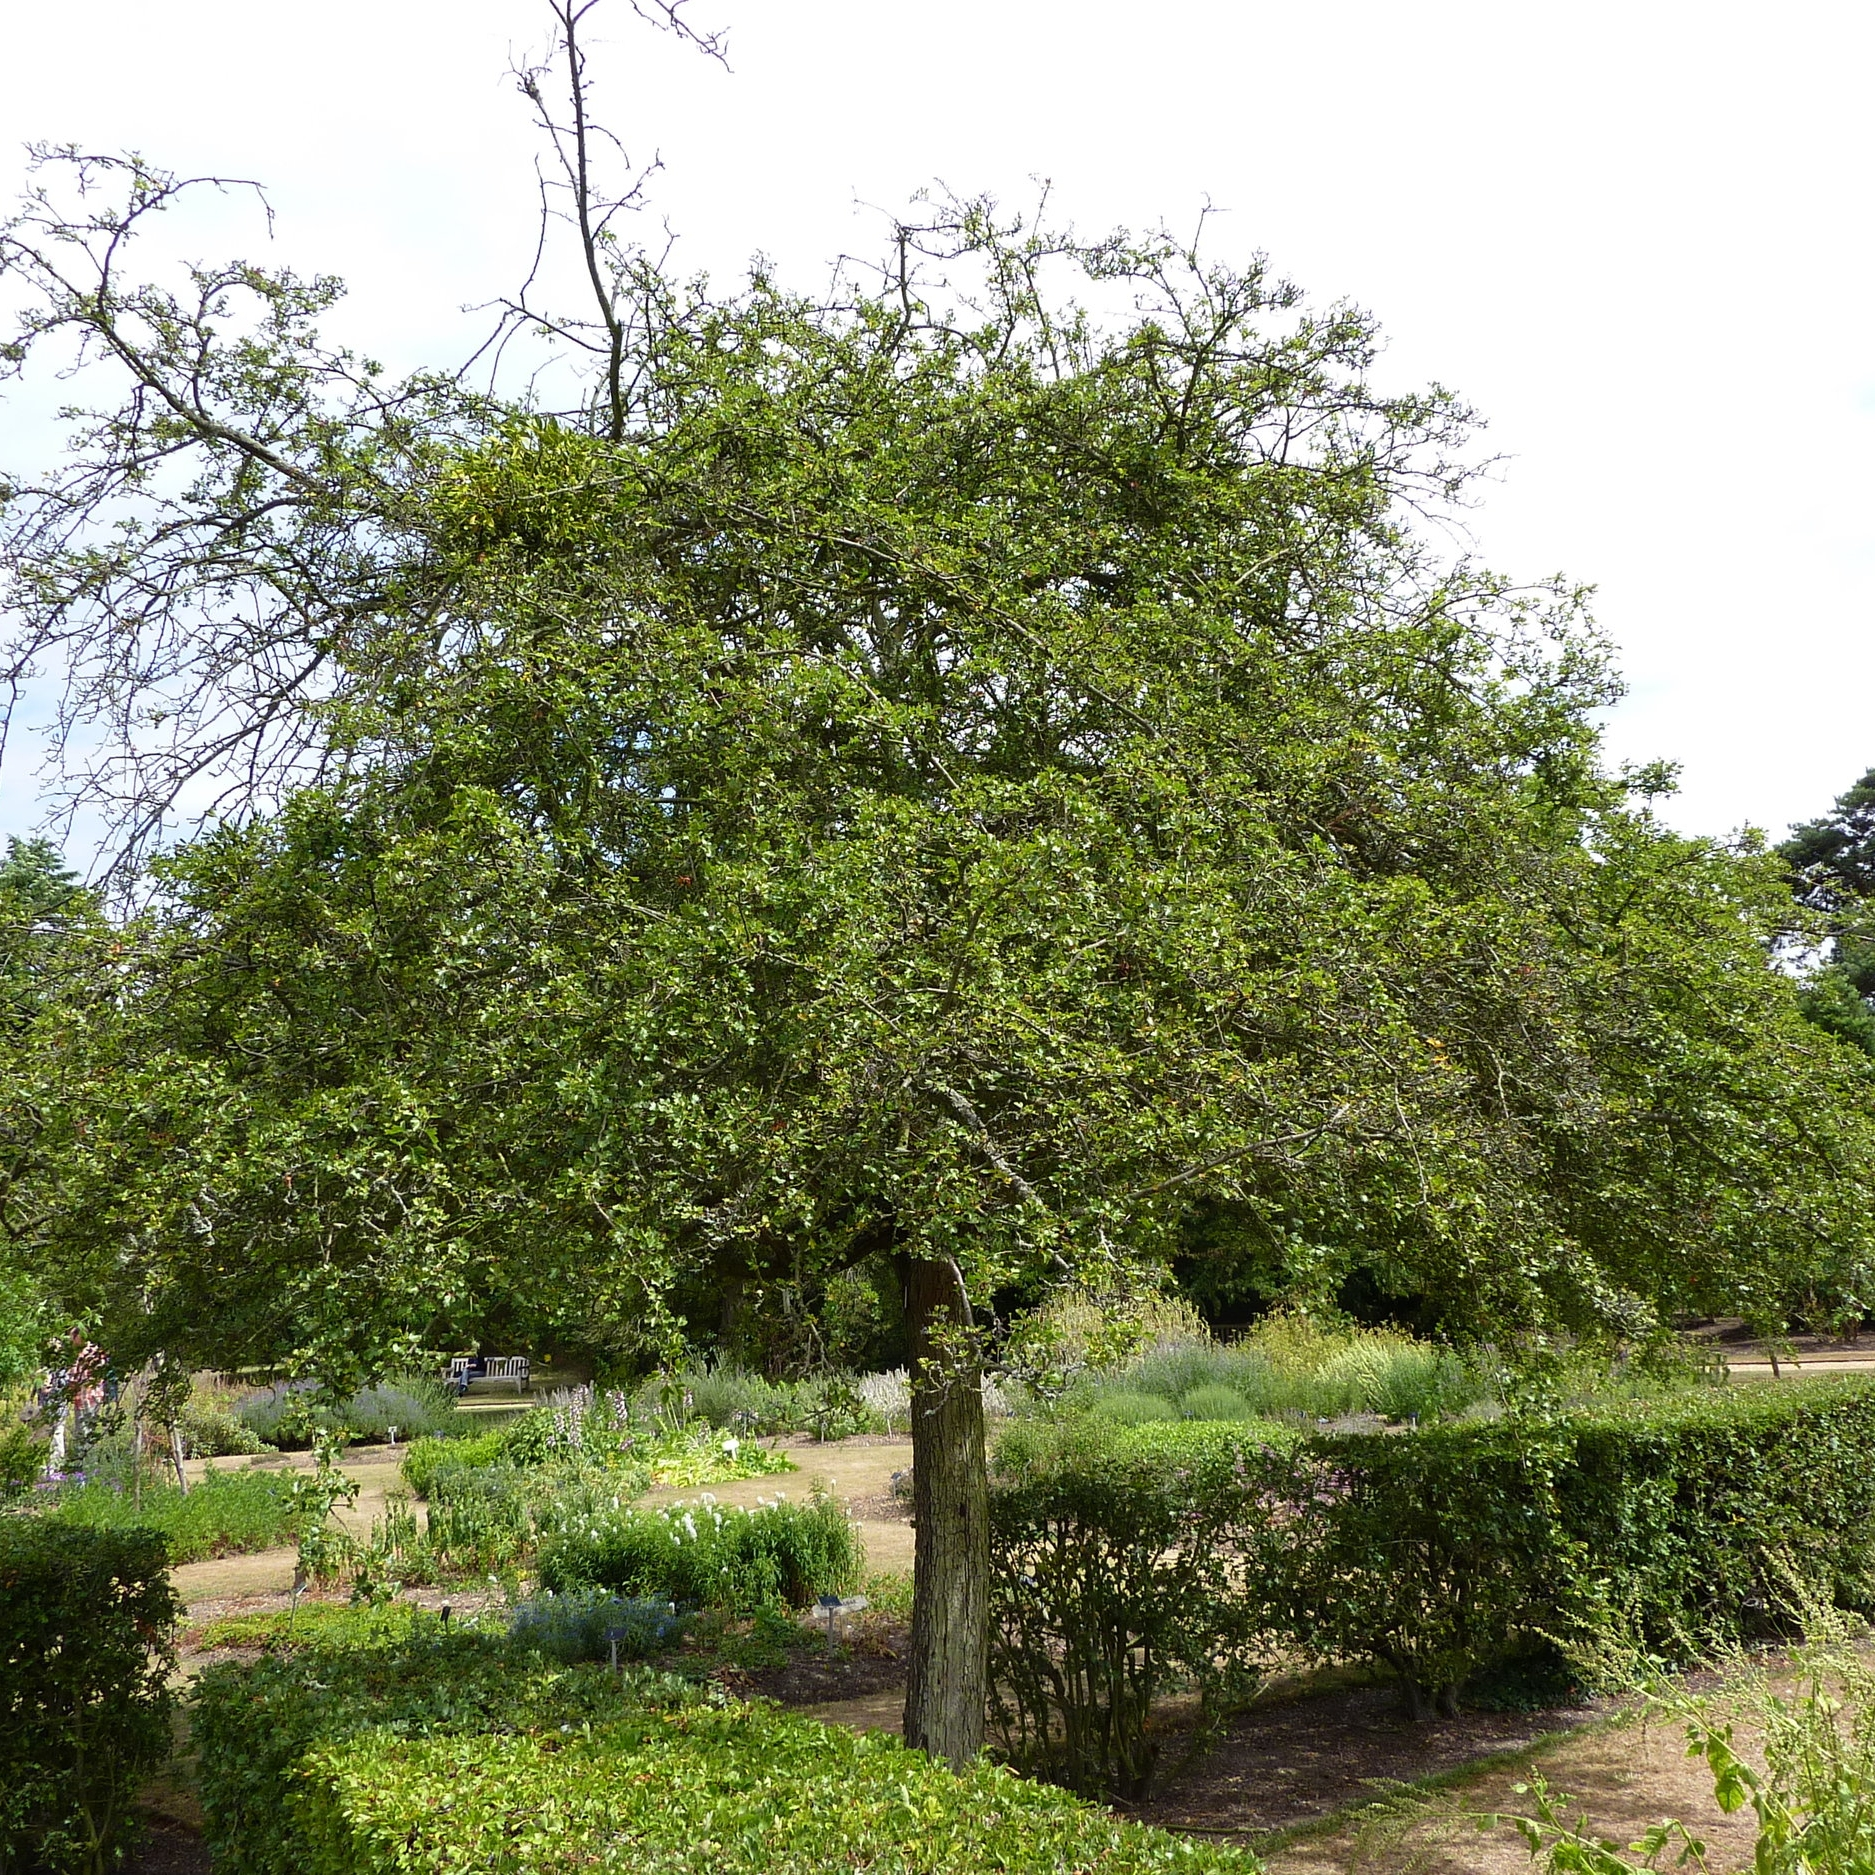 Crataegus_laevigata_'Punicea'_(Rosaceae)_tree_CC_commons.wikimedia_.JPG